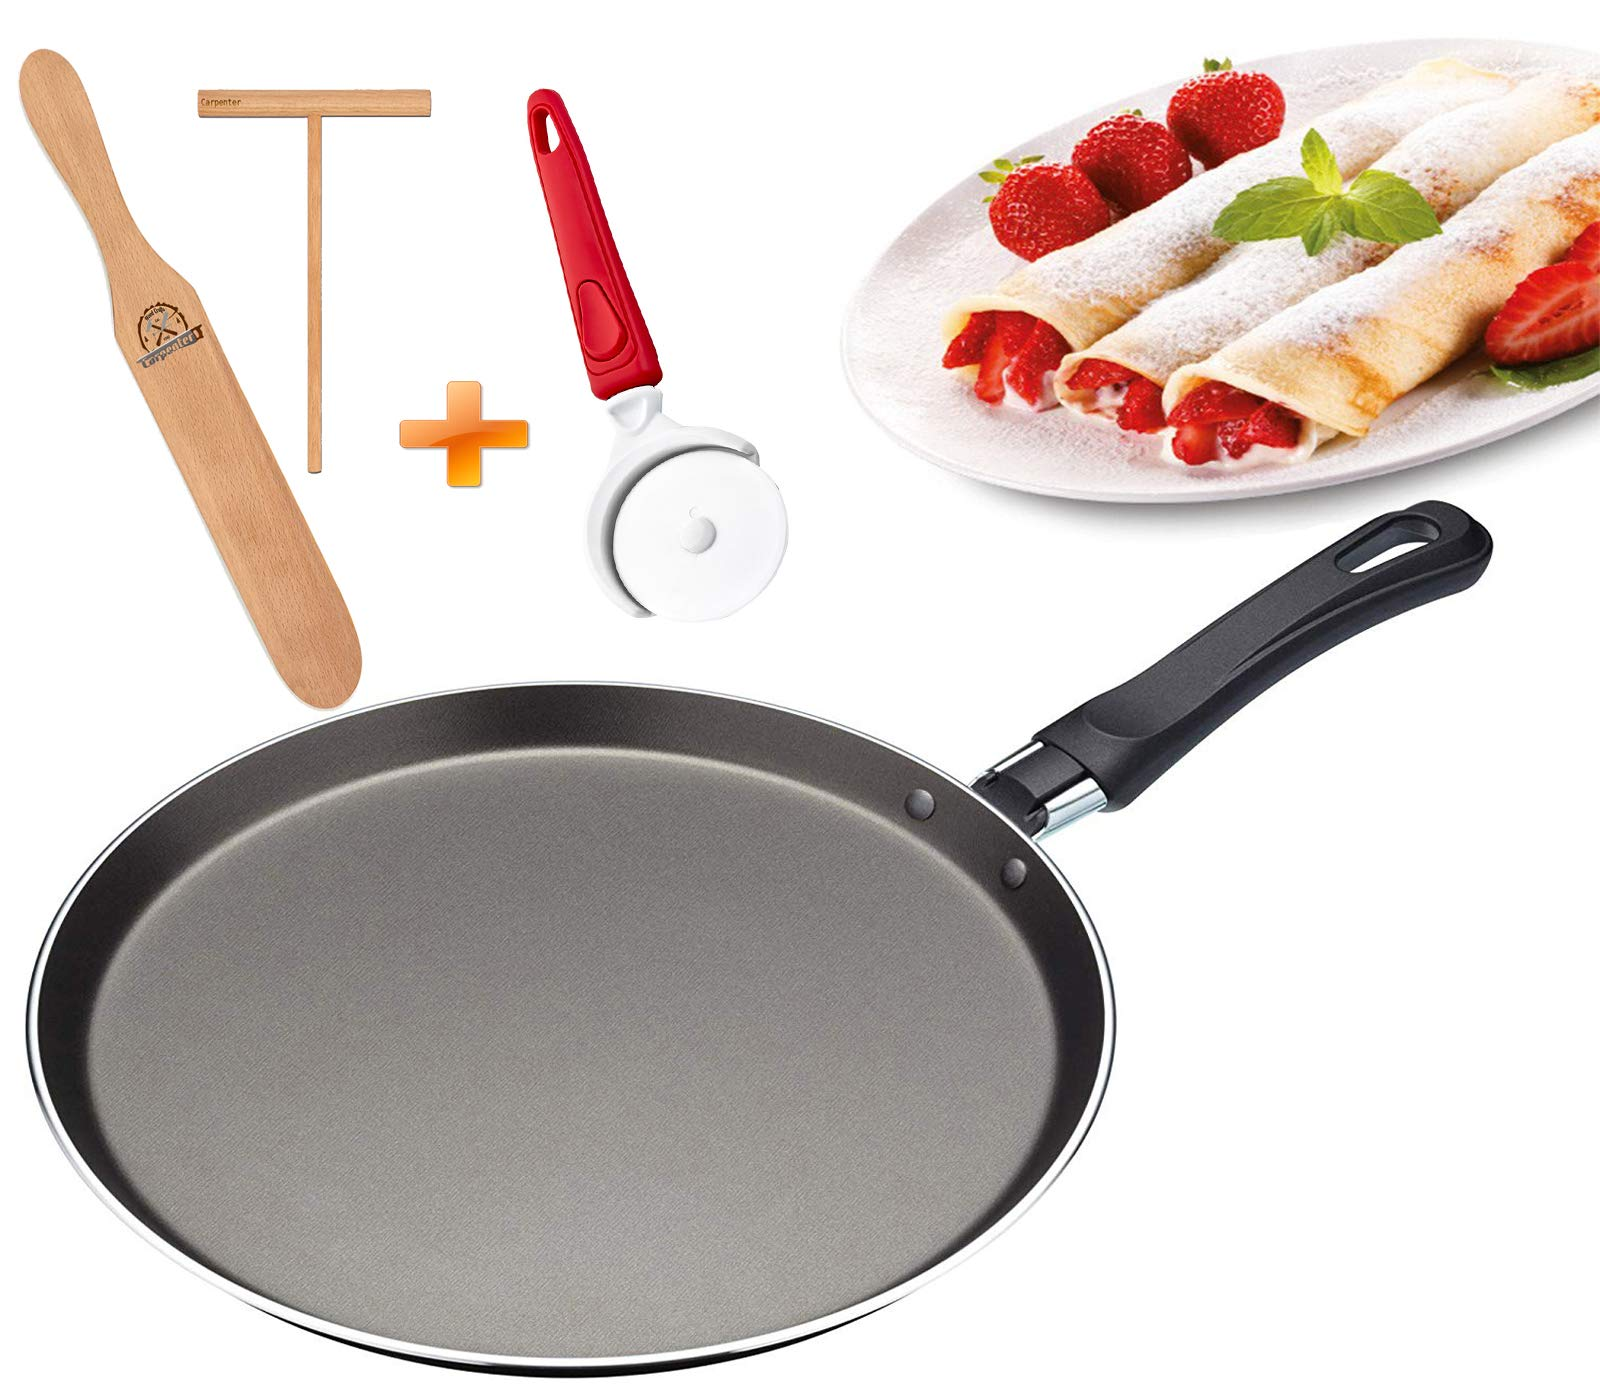 Crepe Pan - Crepe Spatula & Crepe Spreader 3.5'' Set - Double Nonstick Pancake Pan - Healthy Cooking - Ergonomic Handle - Uniform Heat Distribution (Pack 3) by KitchenGear